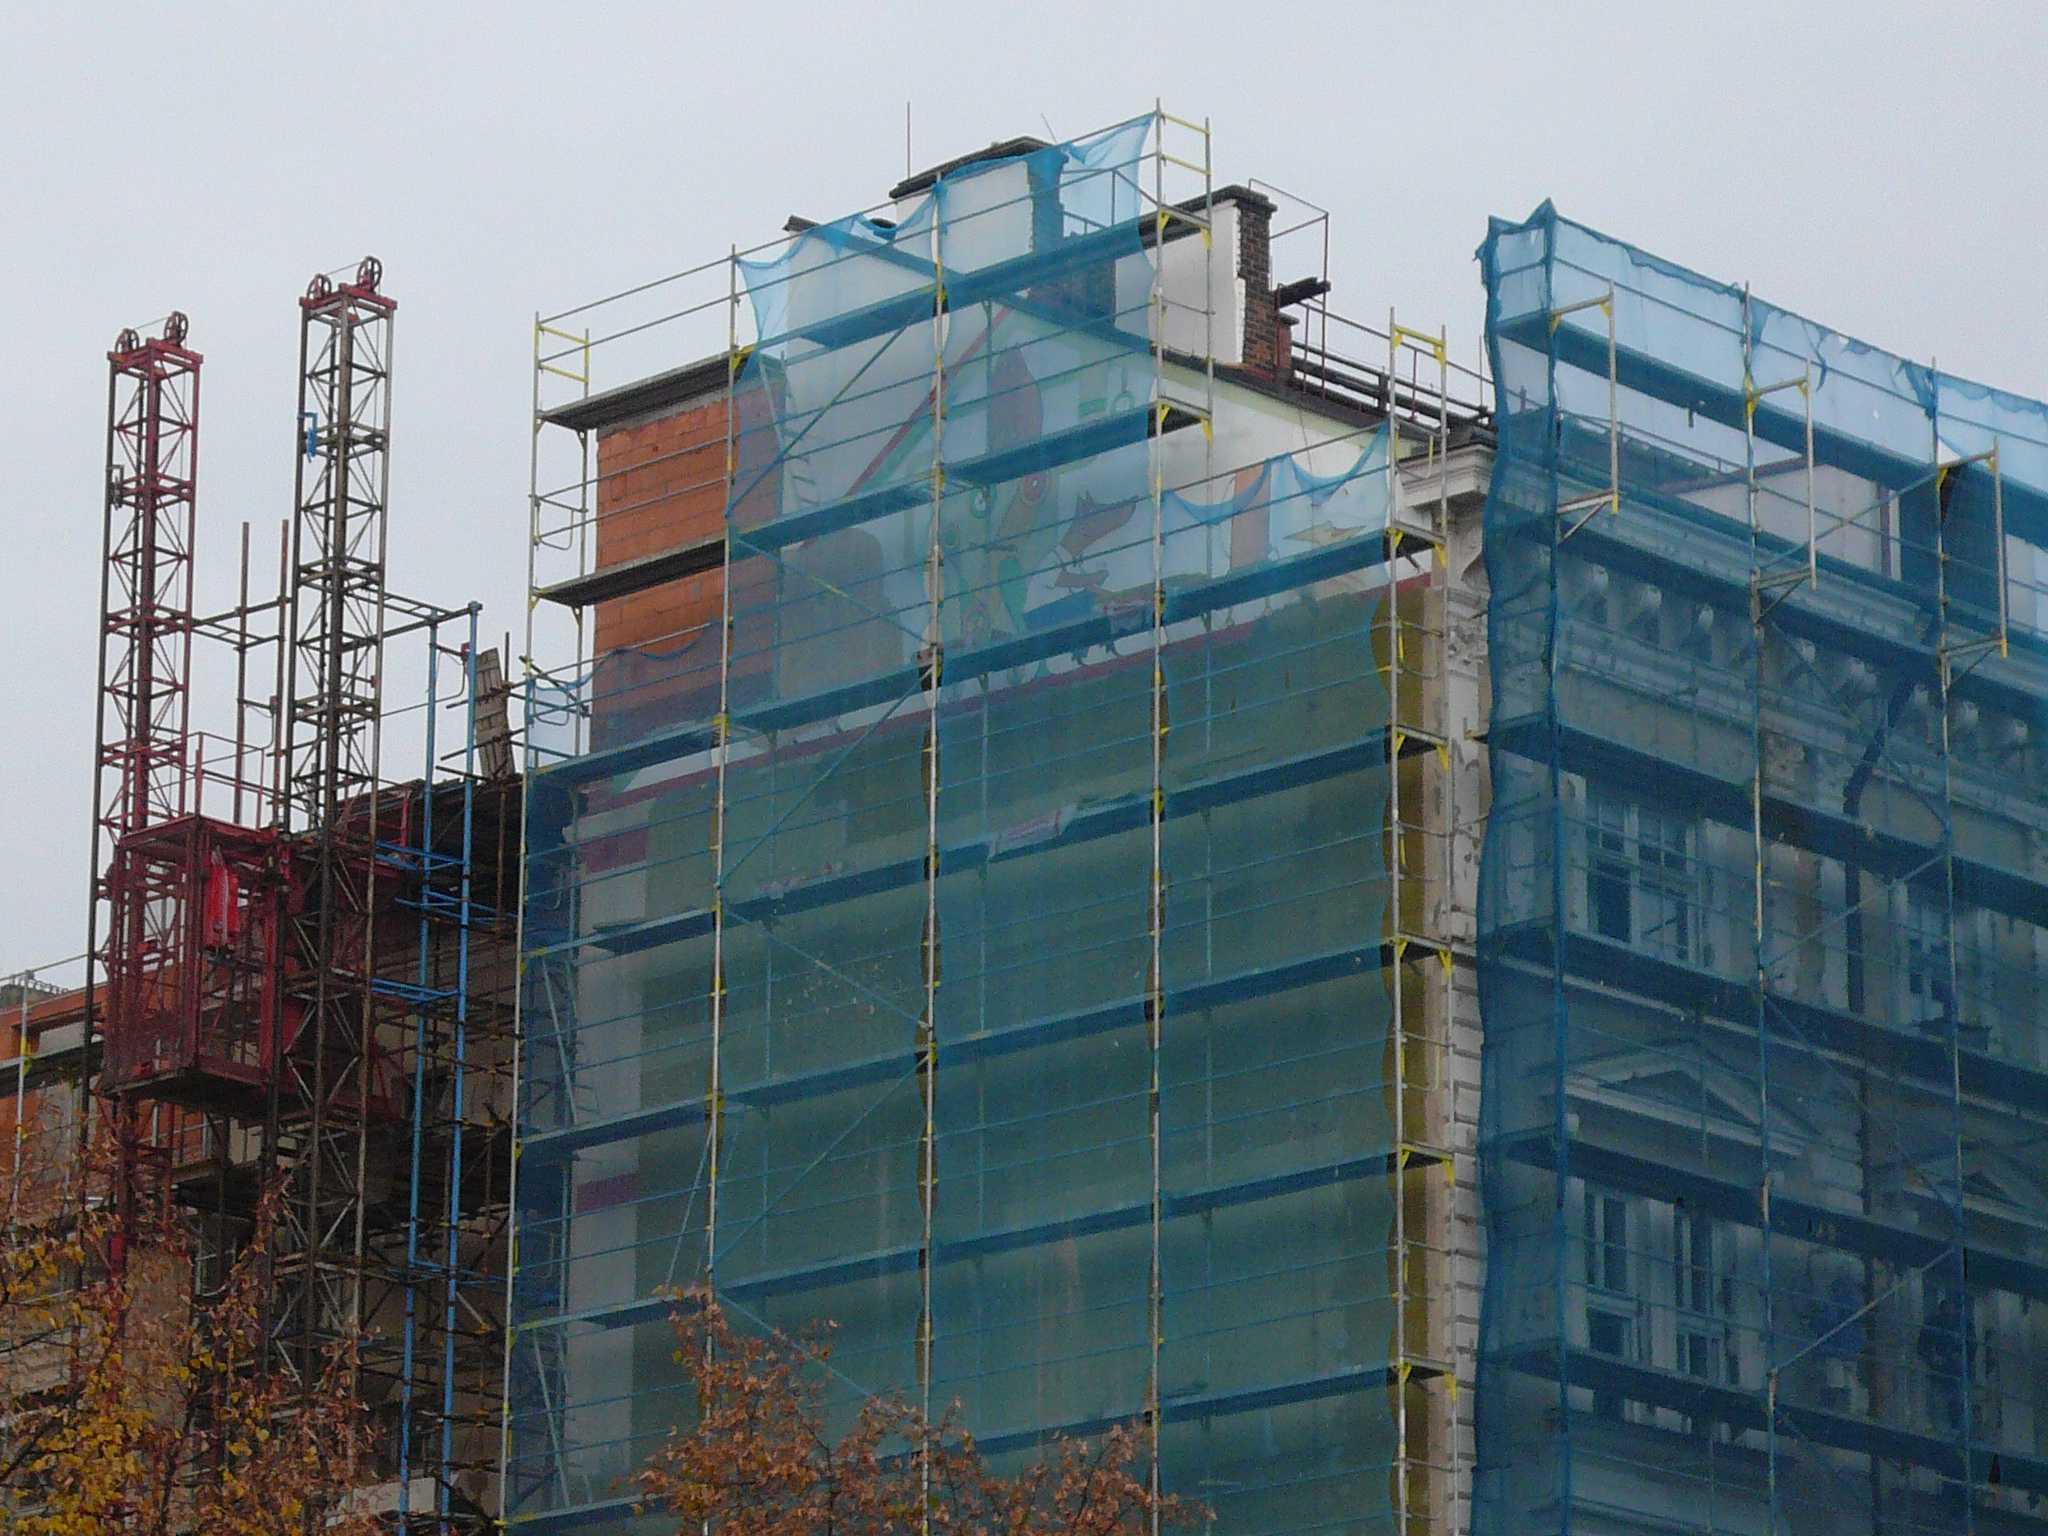 p�estavba budovy M욝ansk� Besedy - listopad 2007